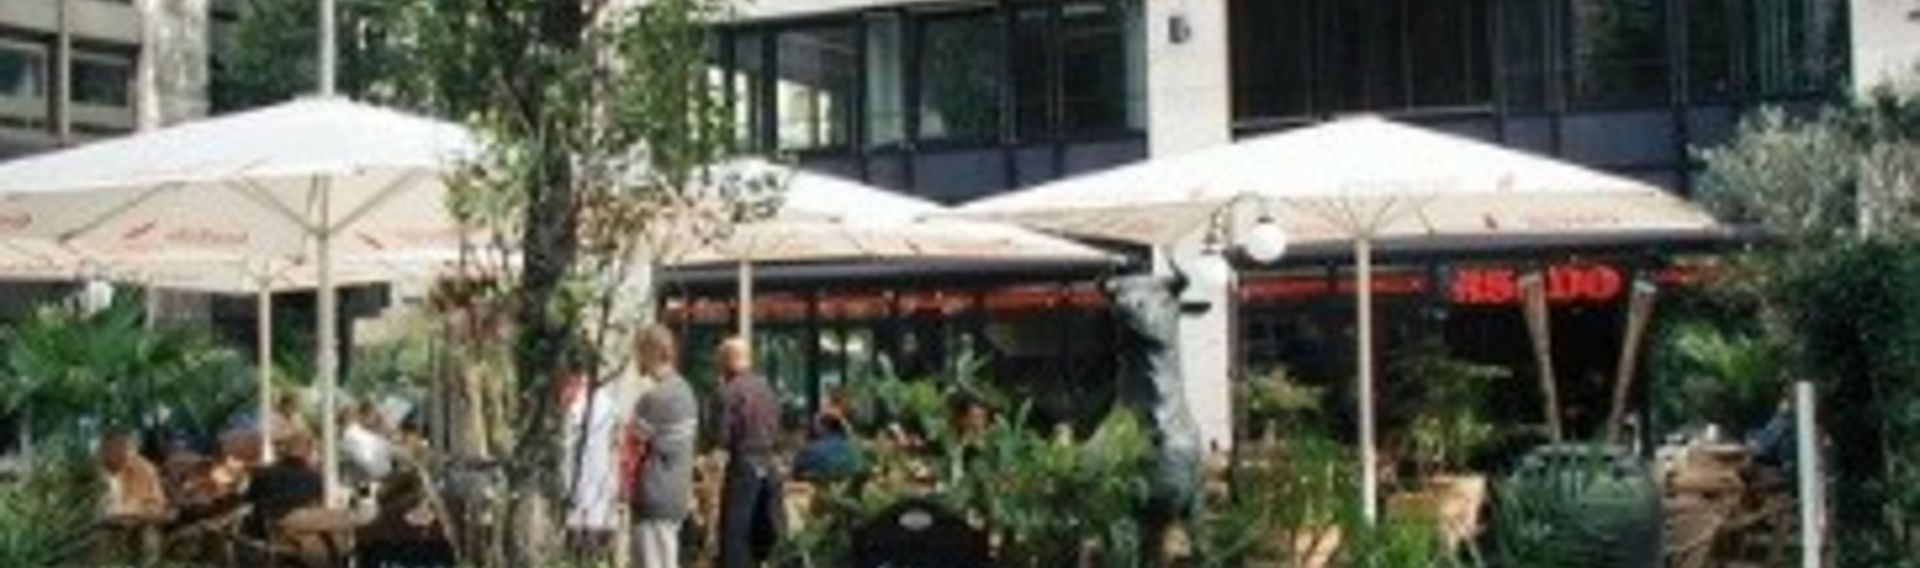 Restaurant Asado Steak in München Schwabing